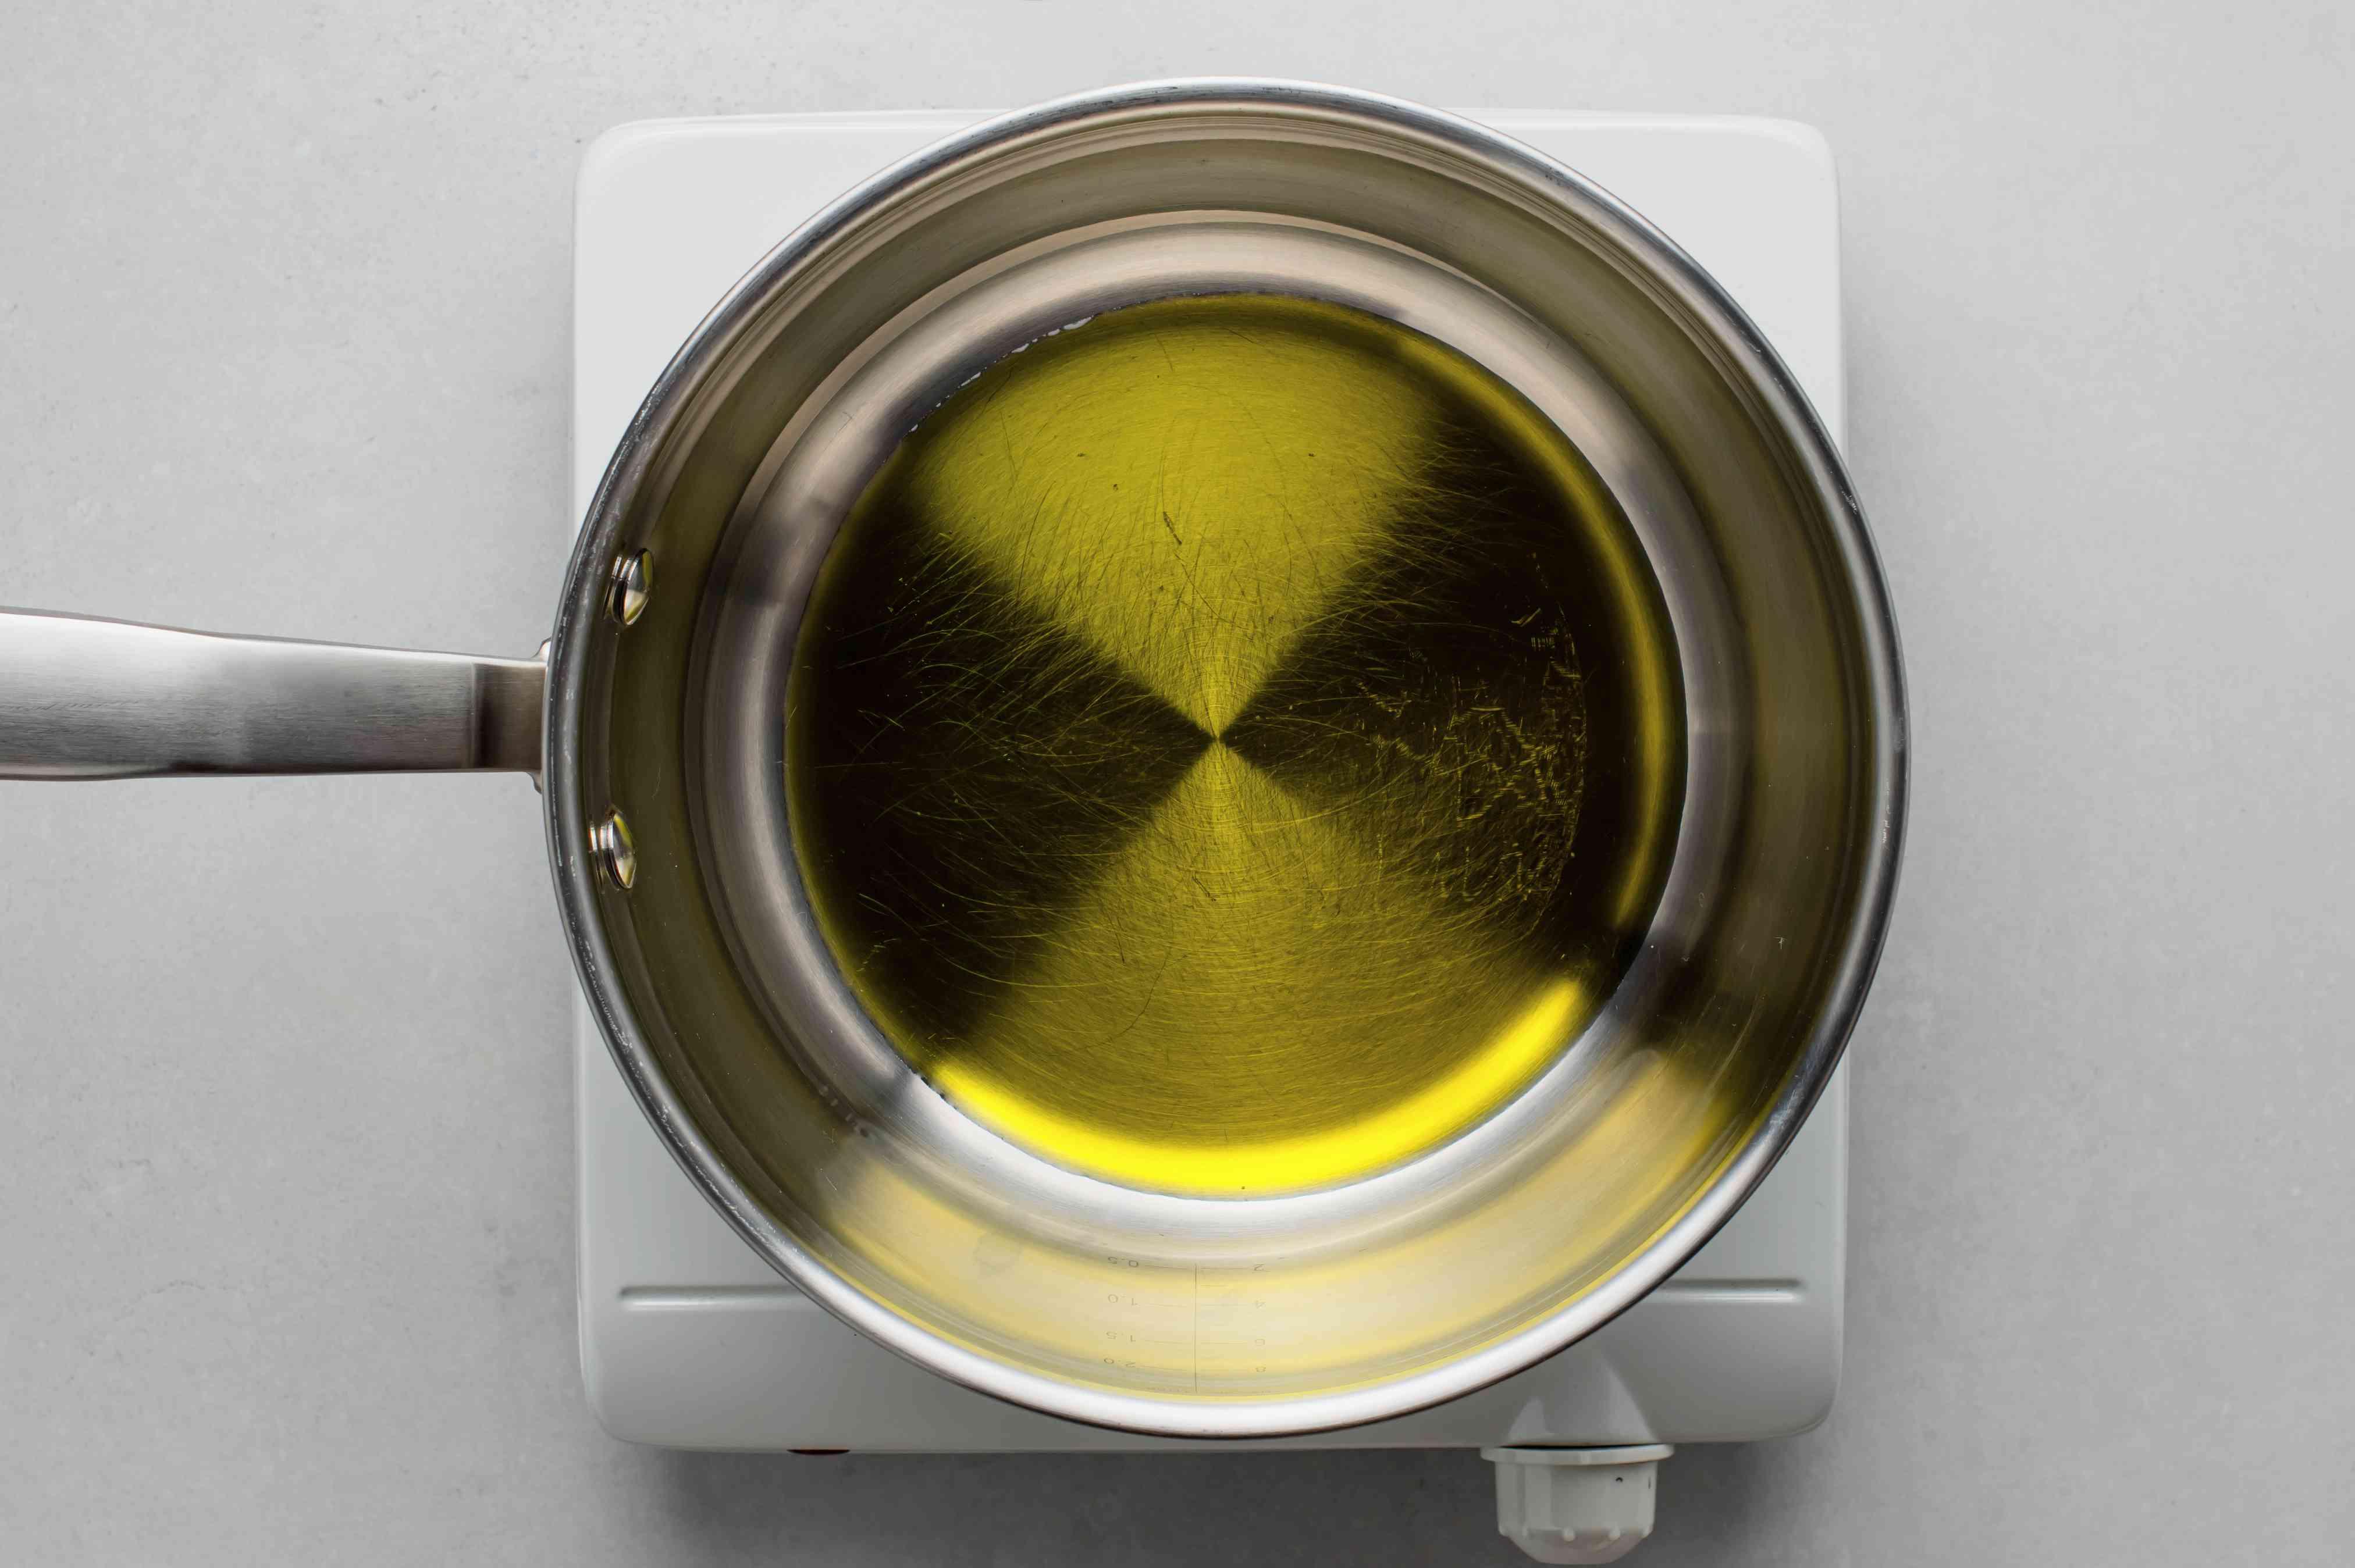 oil in a saucepan